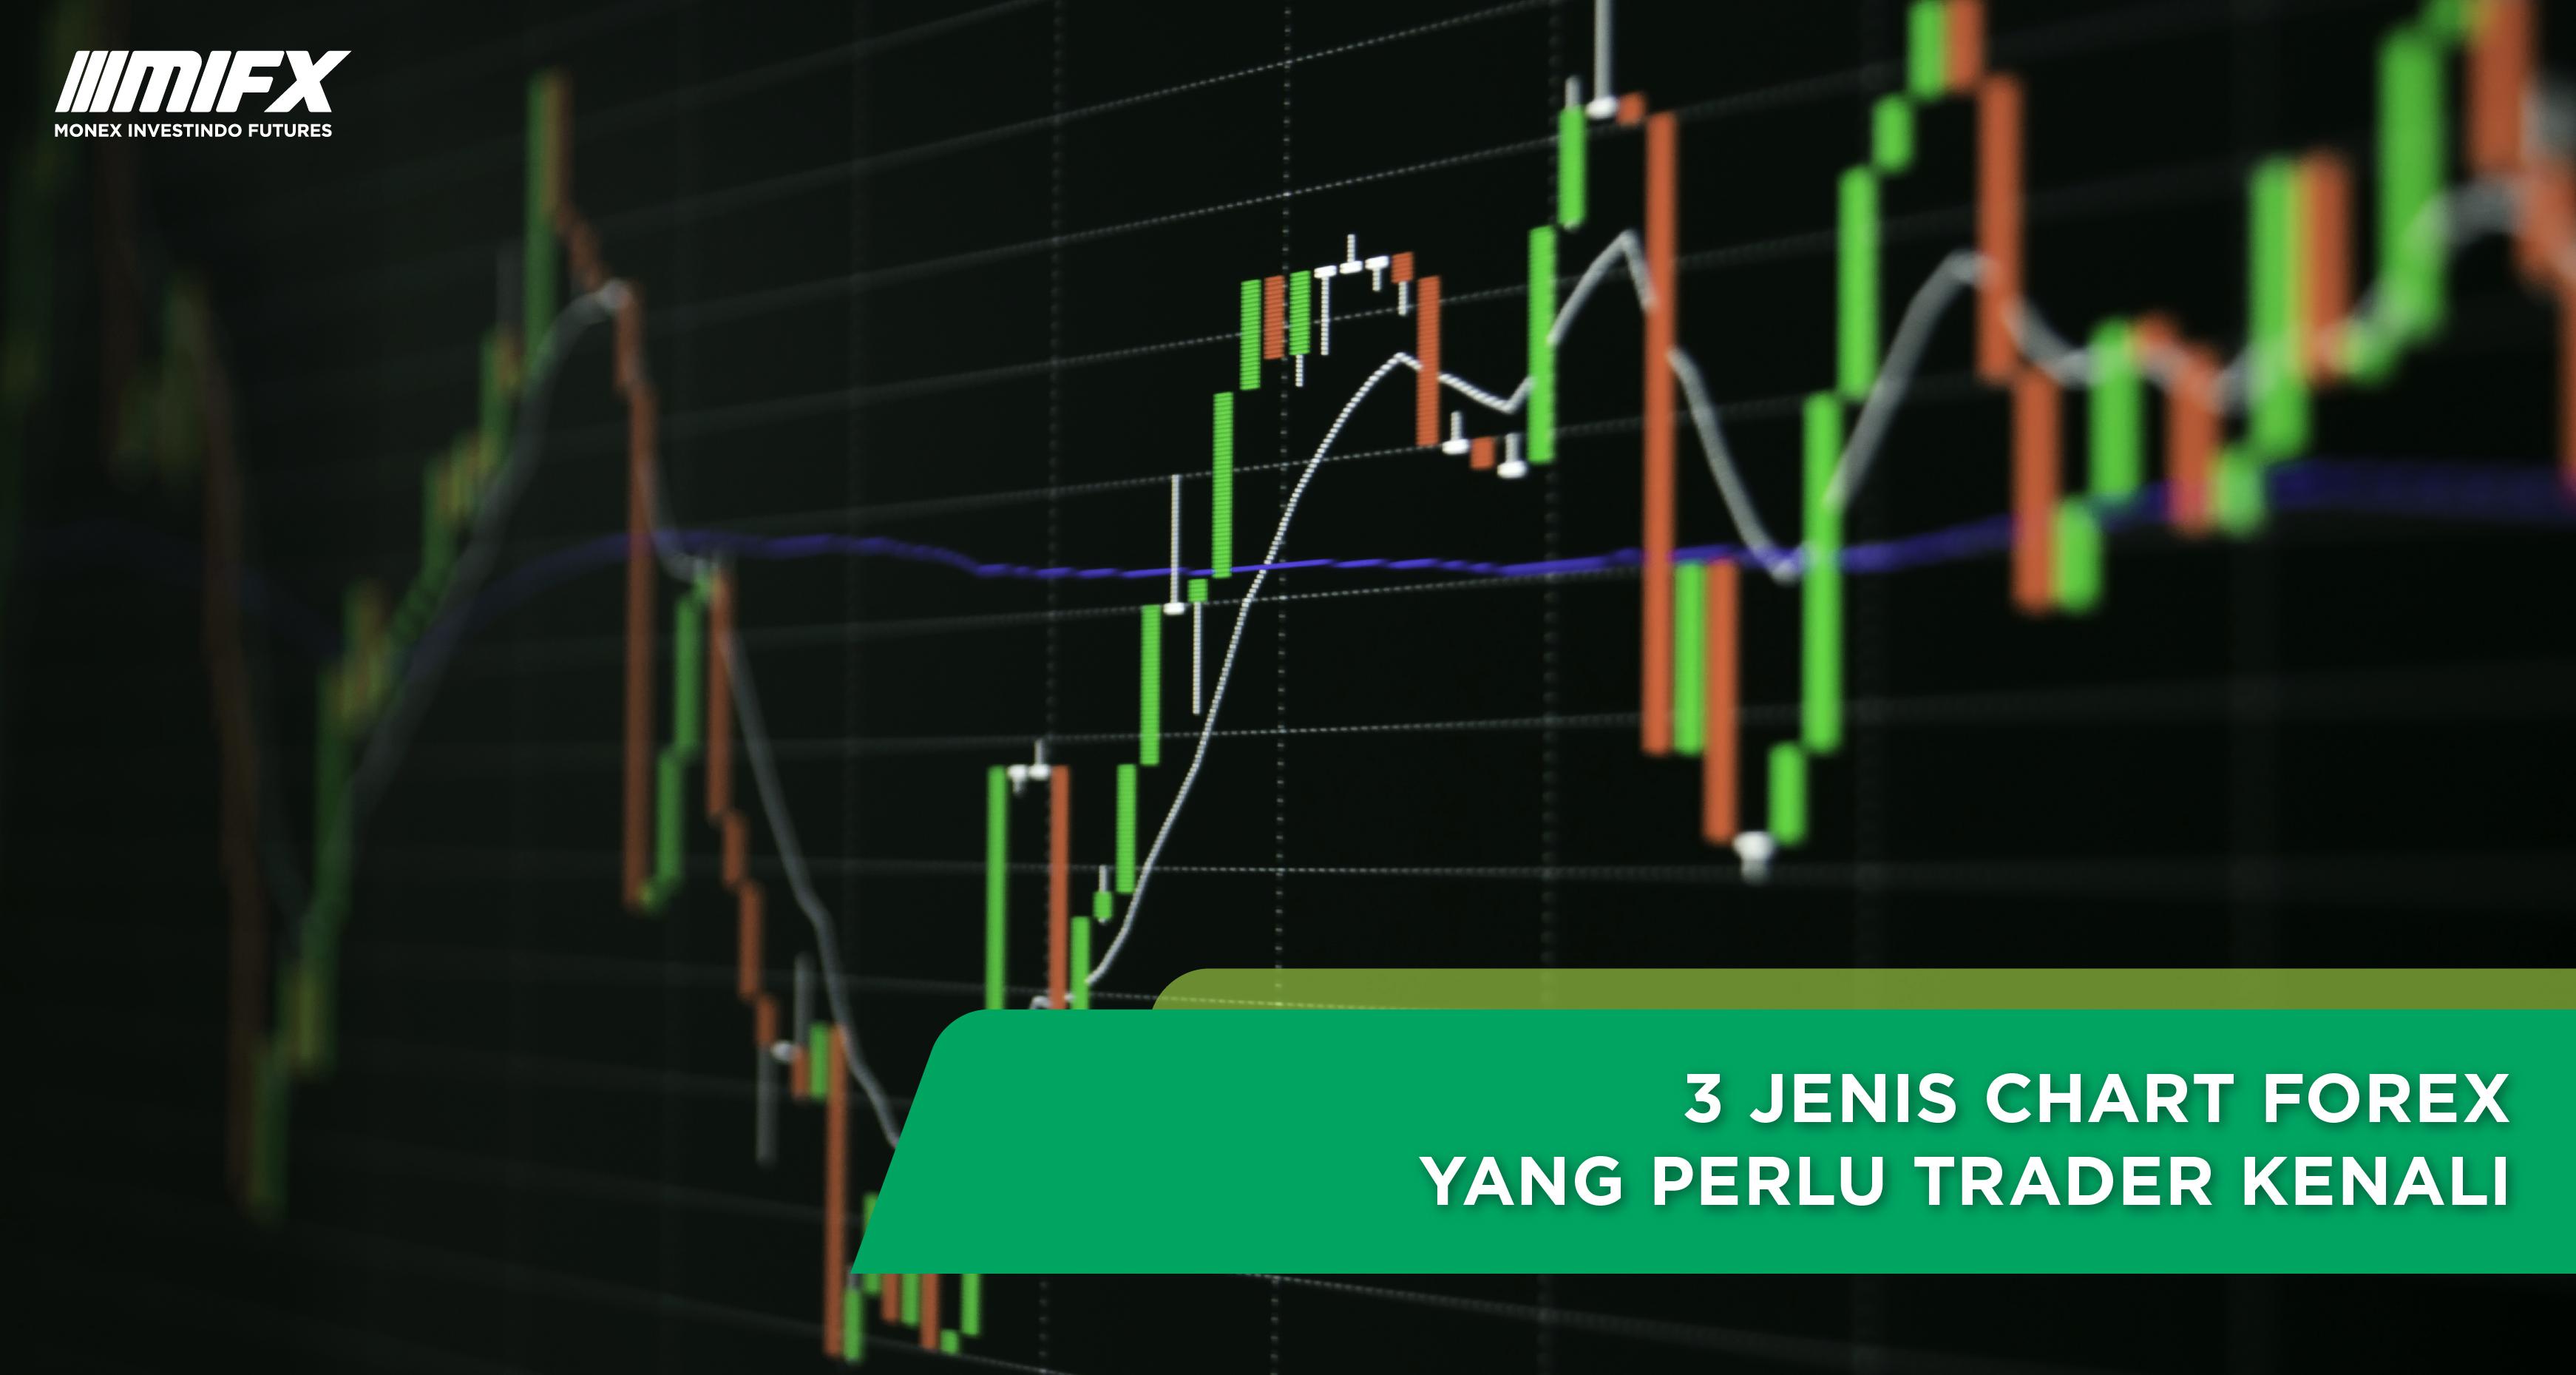 -article-07-3-jenis-chart-forex1594707771.jpg